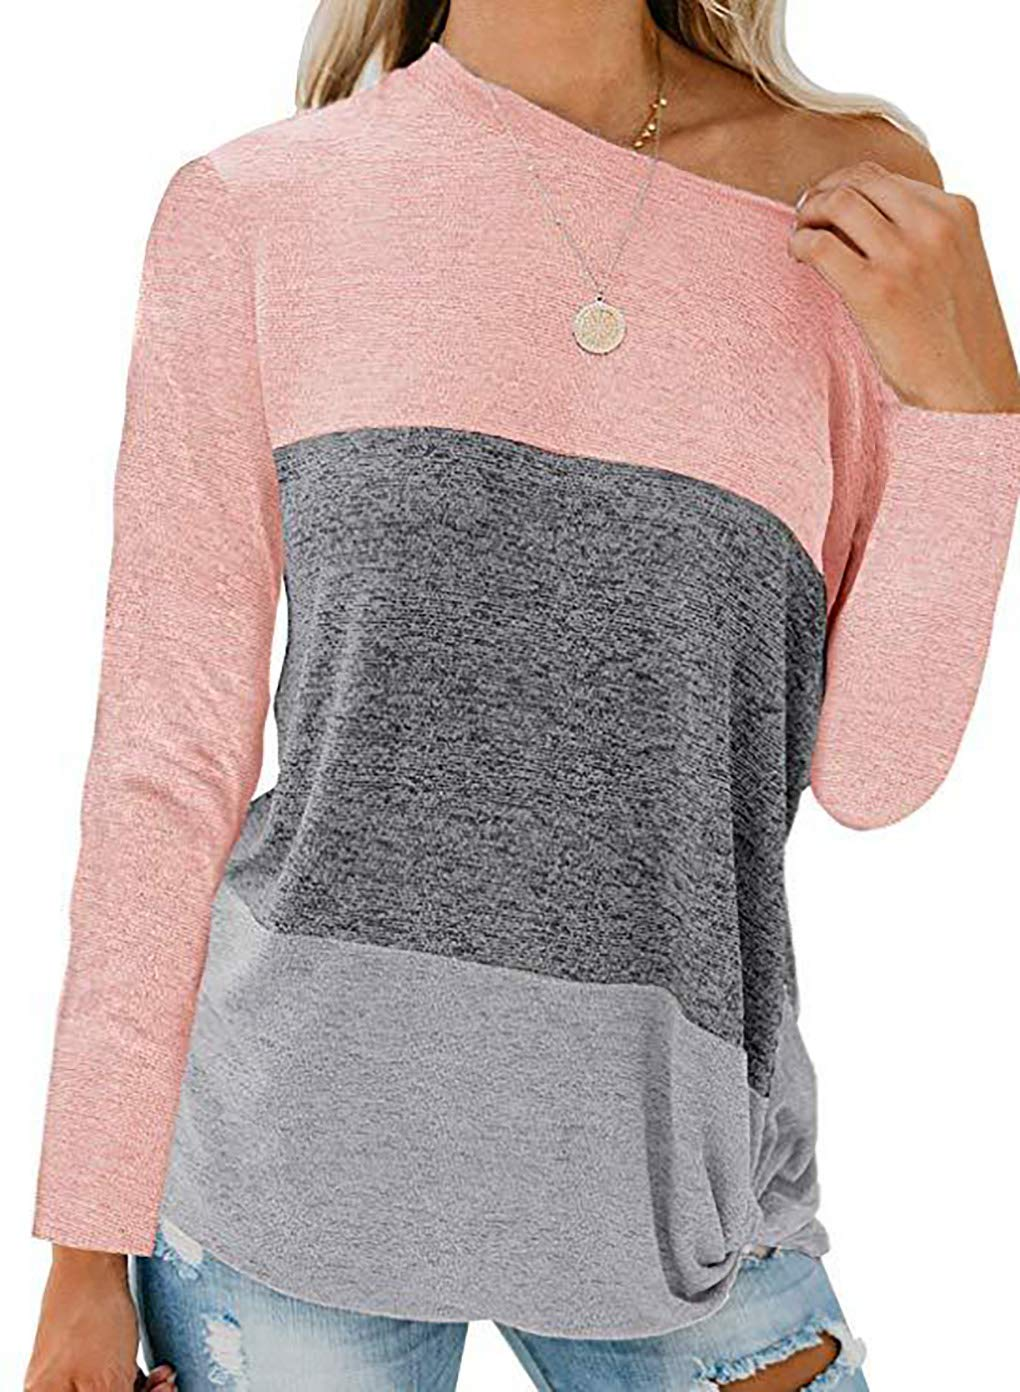 Mrsrui Women Tees Long Sleeves Casual Shirts TOS Basic Blouse Pink by Mrsrui